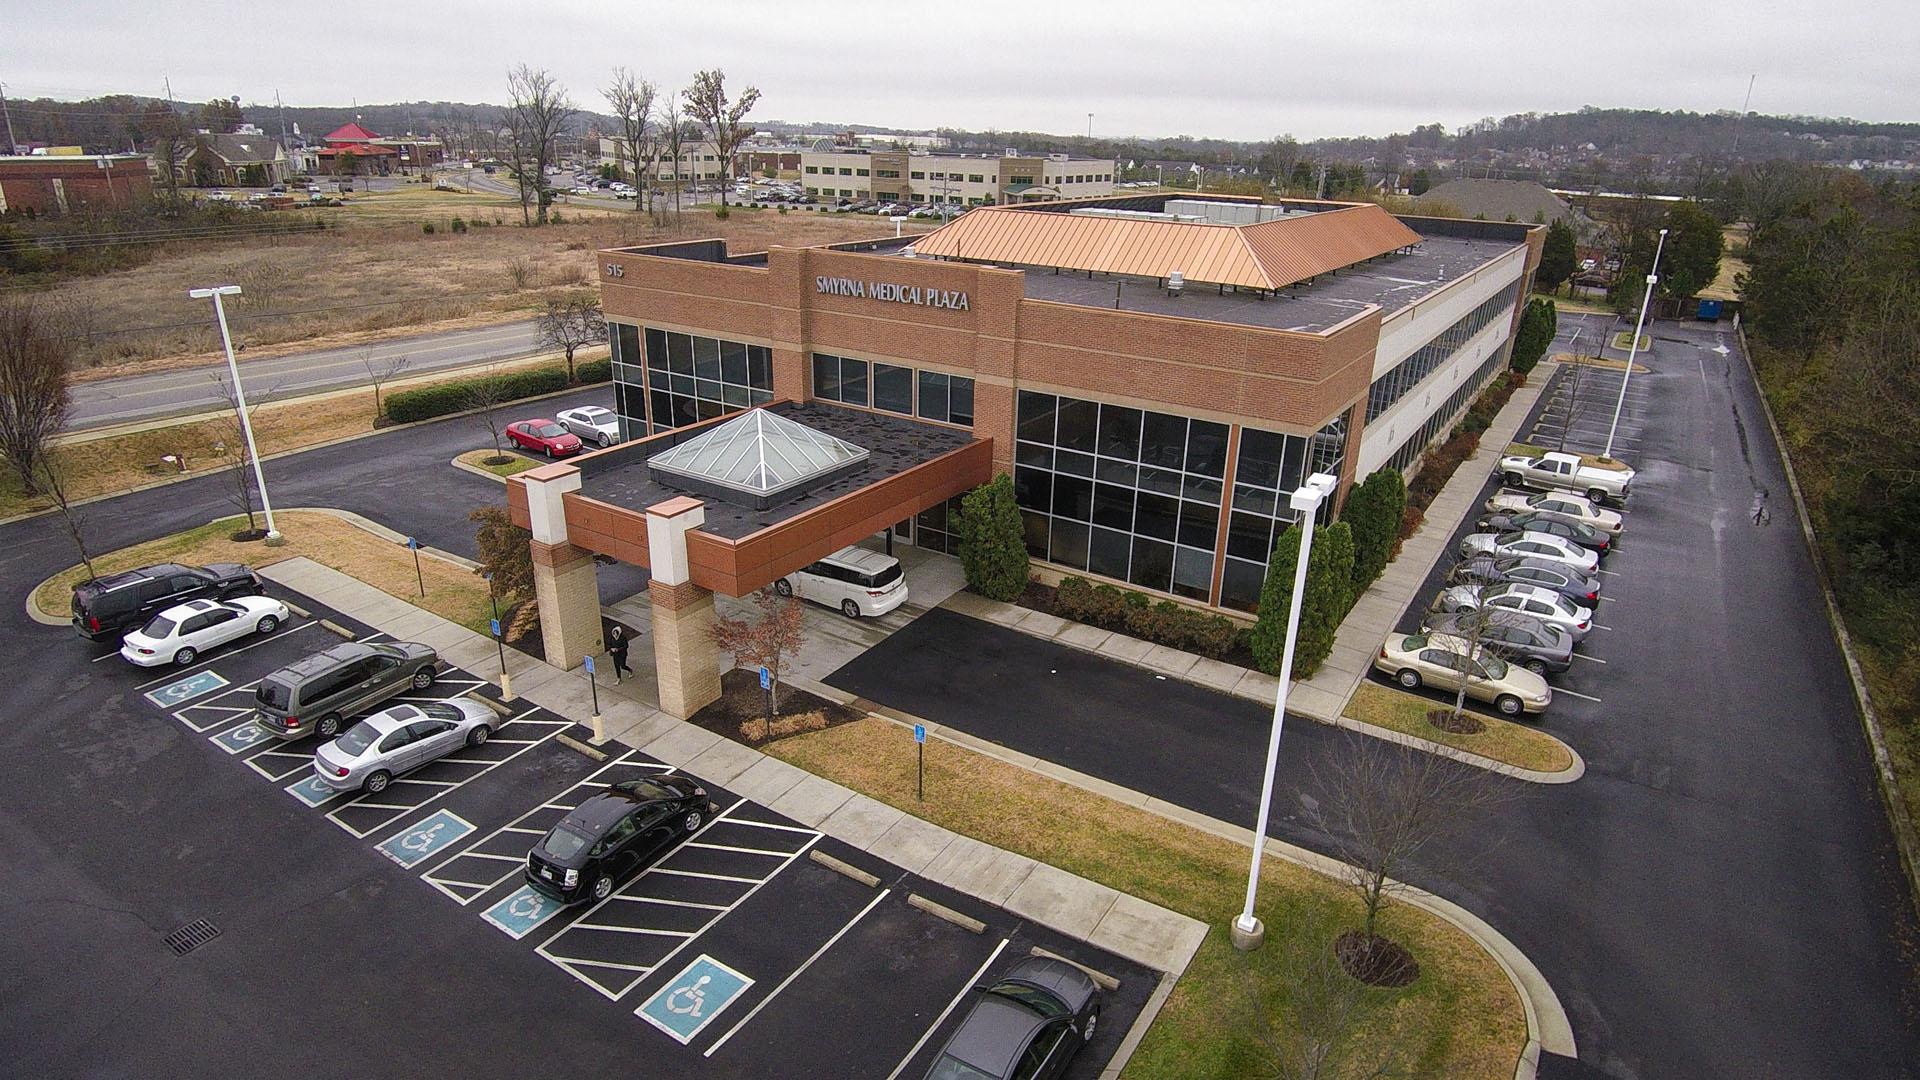 America's Family Doctors & Walk-in Clinics - Smyrna (Smyrna, TN) - #0